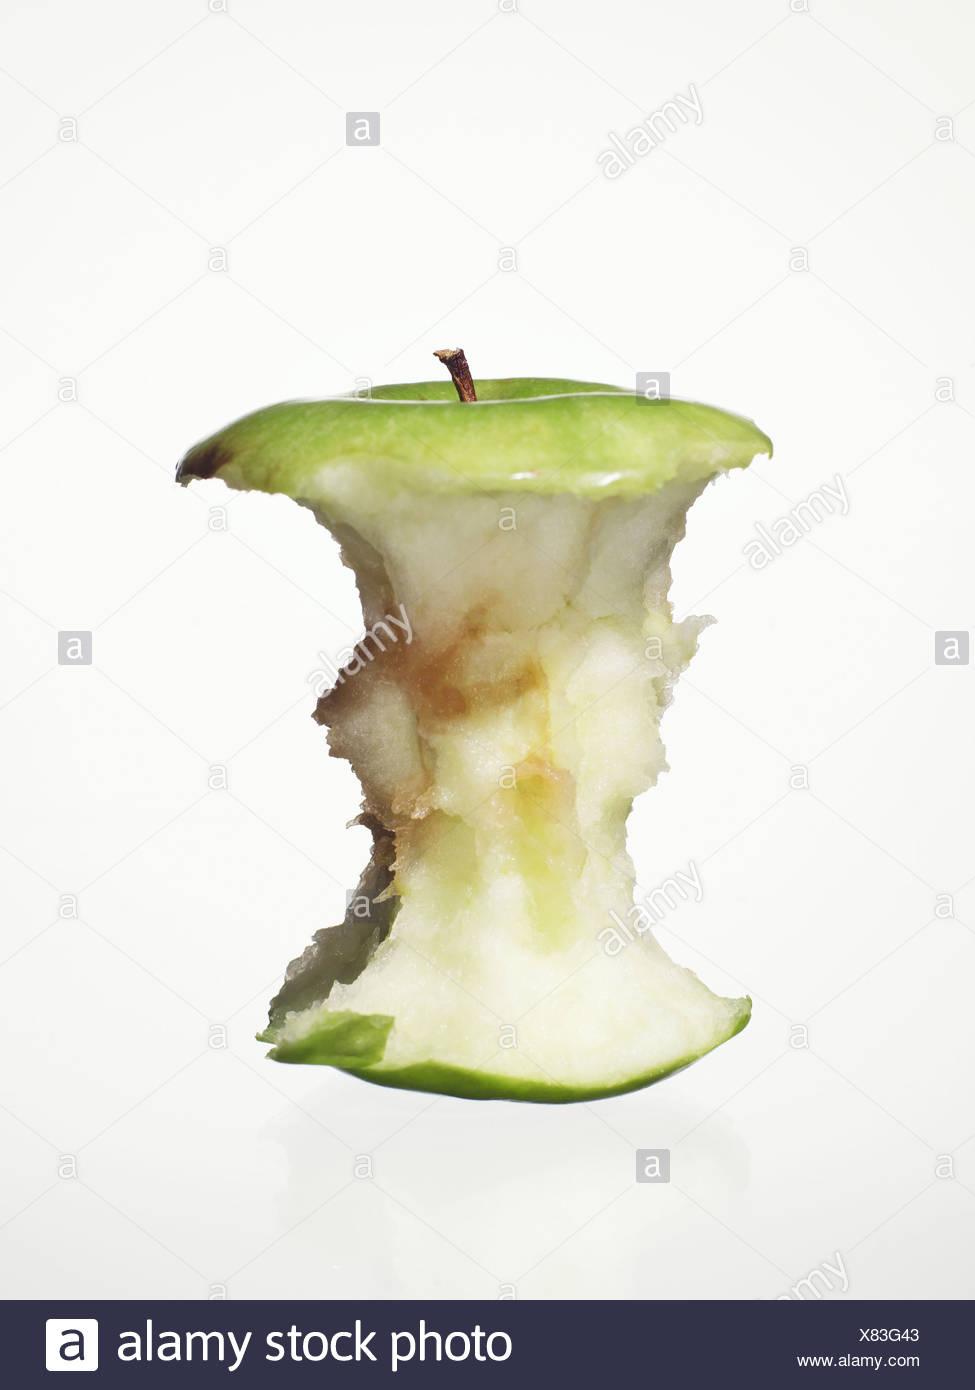 Apple-core. - Stock Image